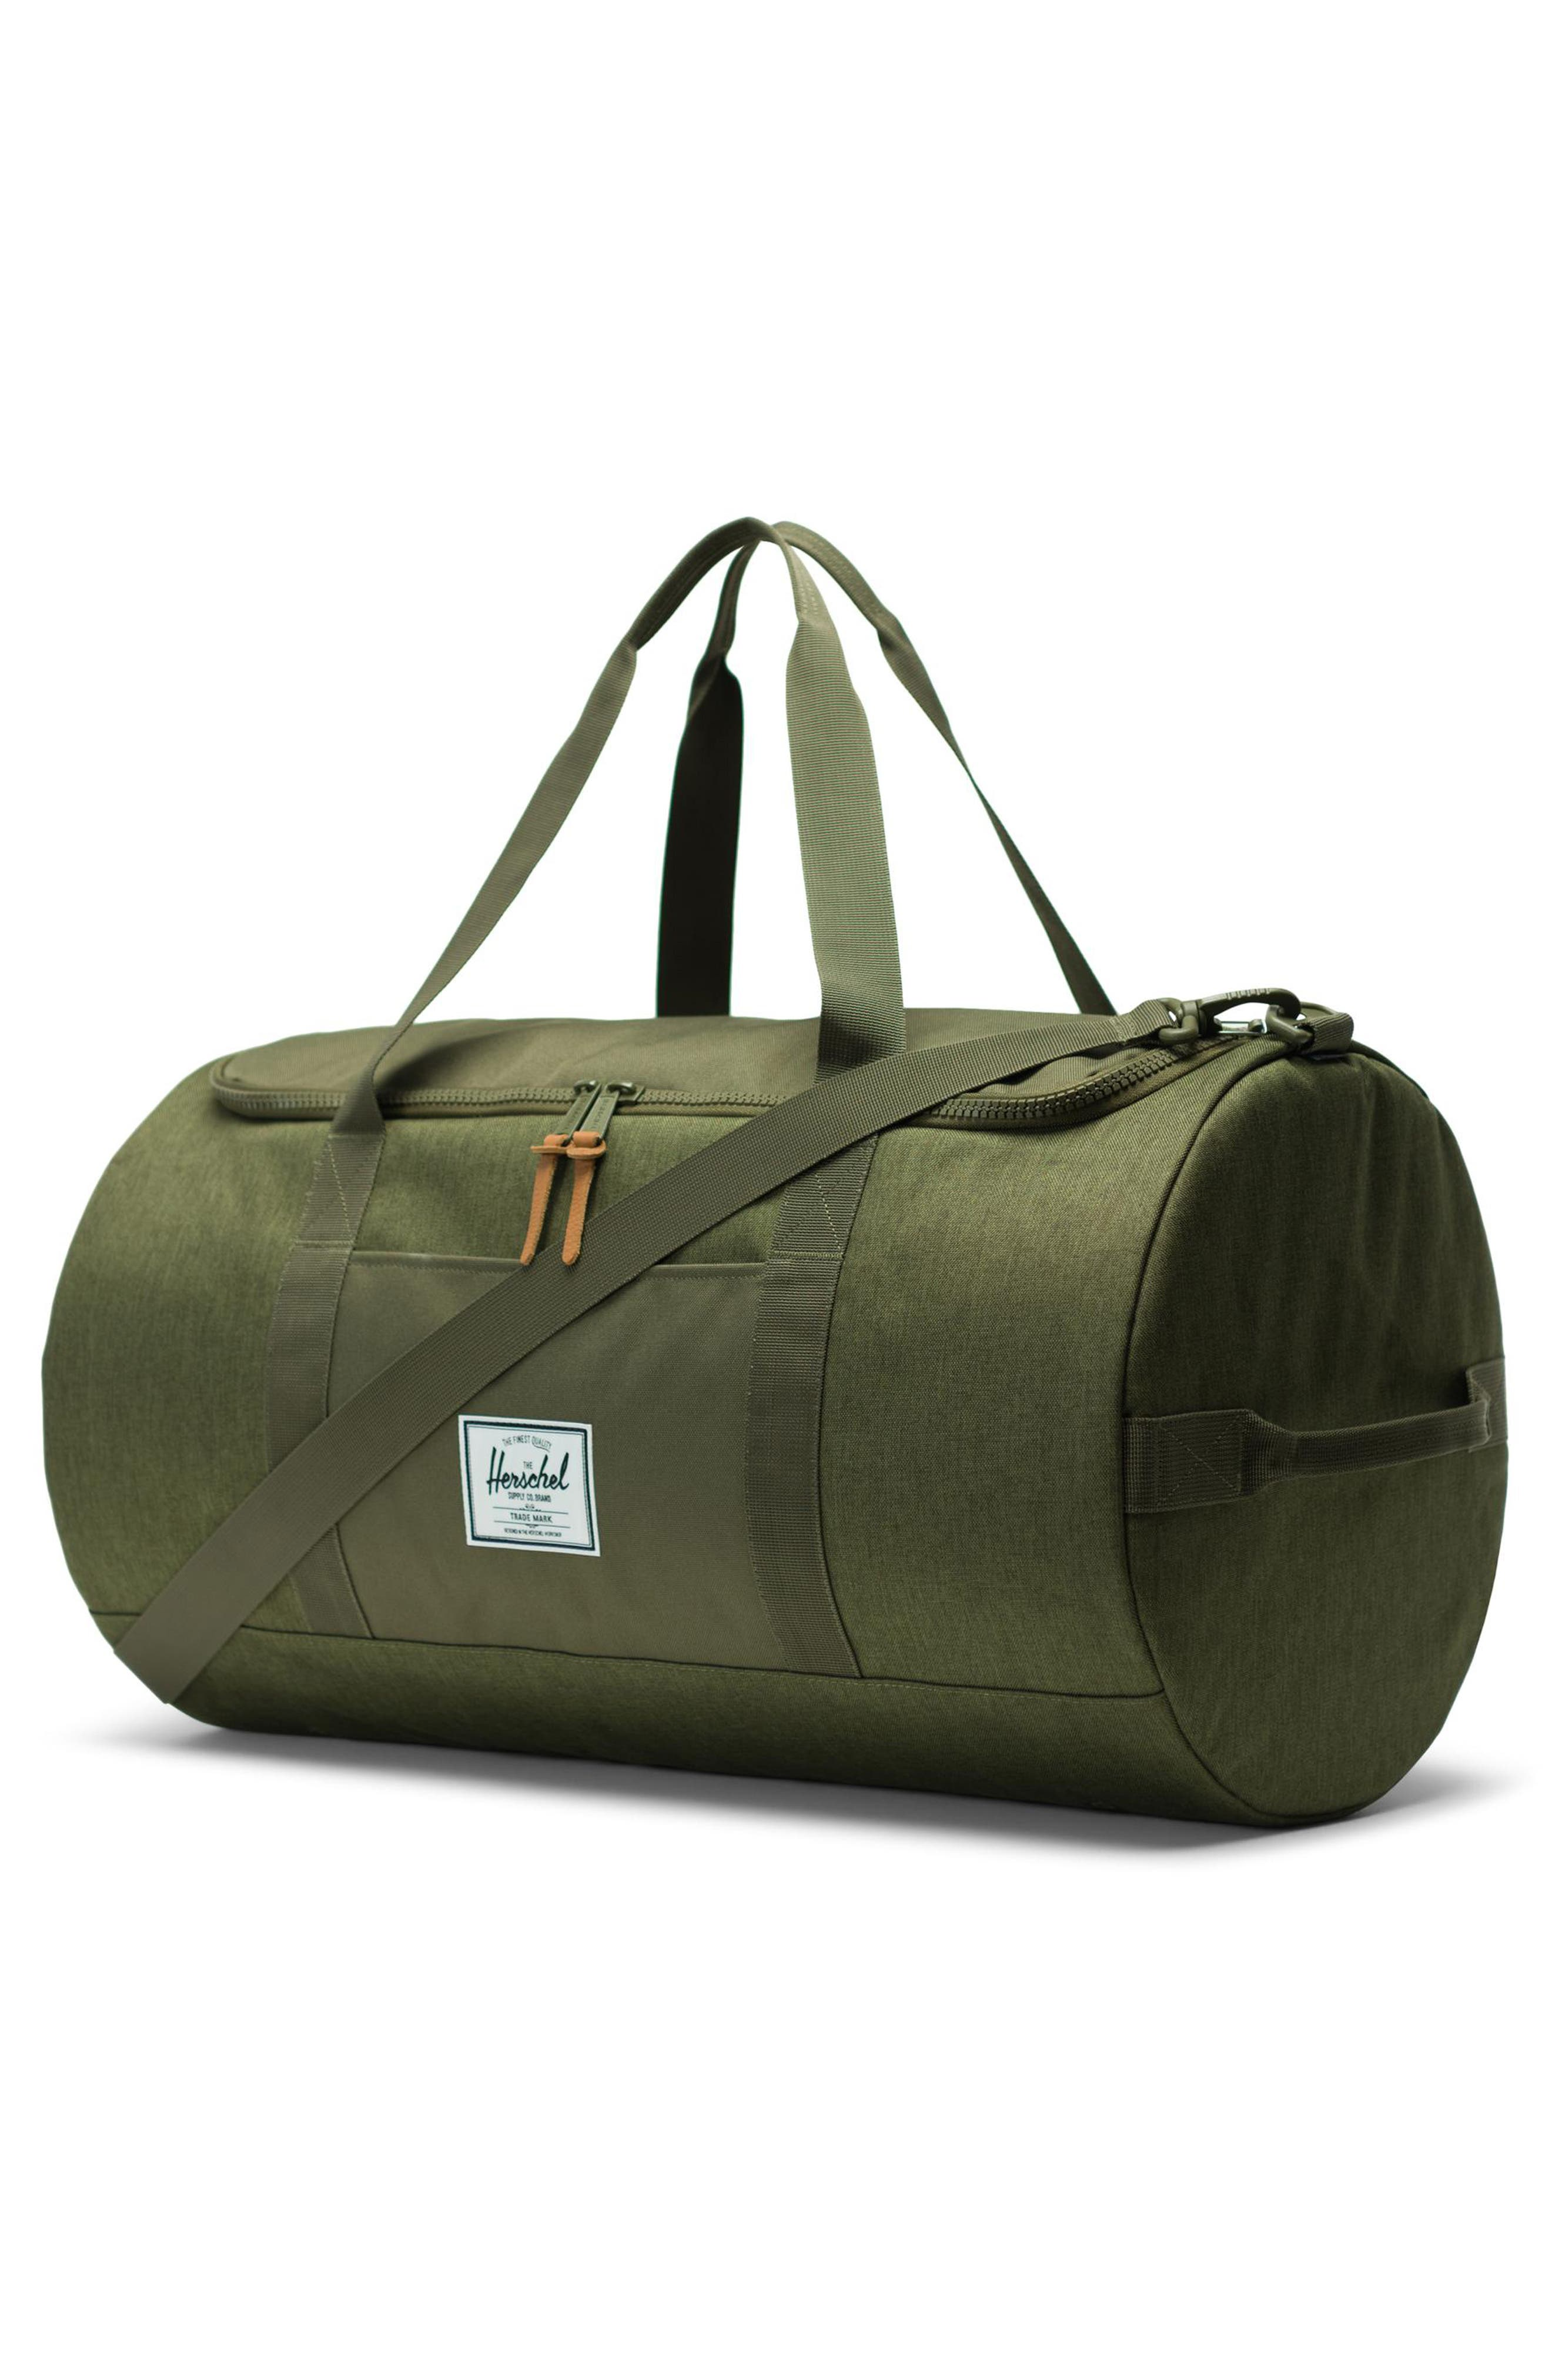 c3a90f5eb6 herschel duffle bag